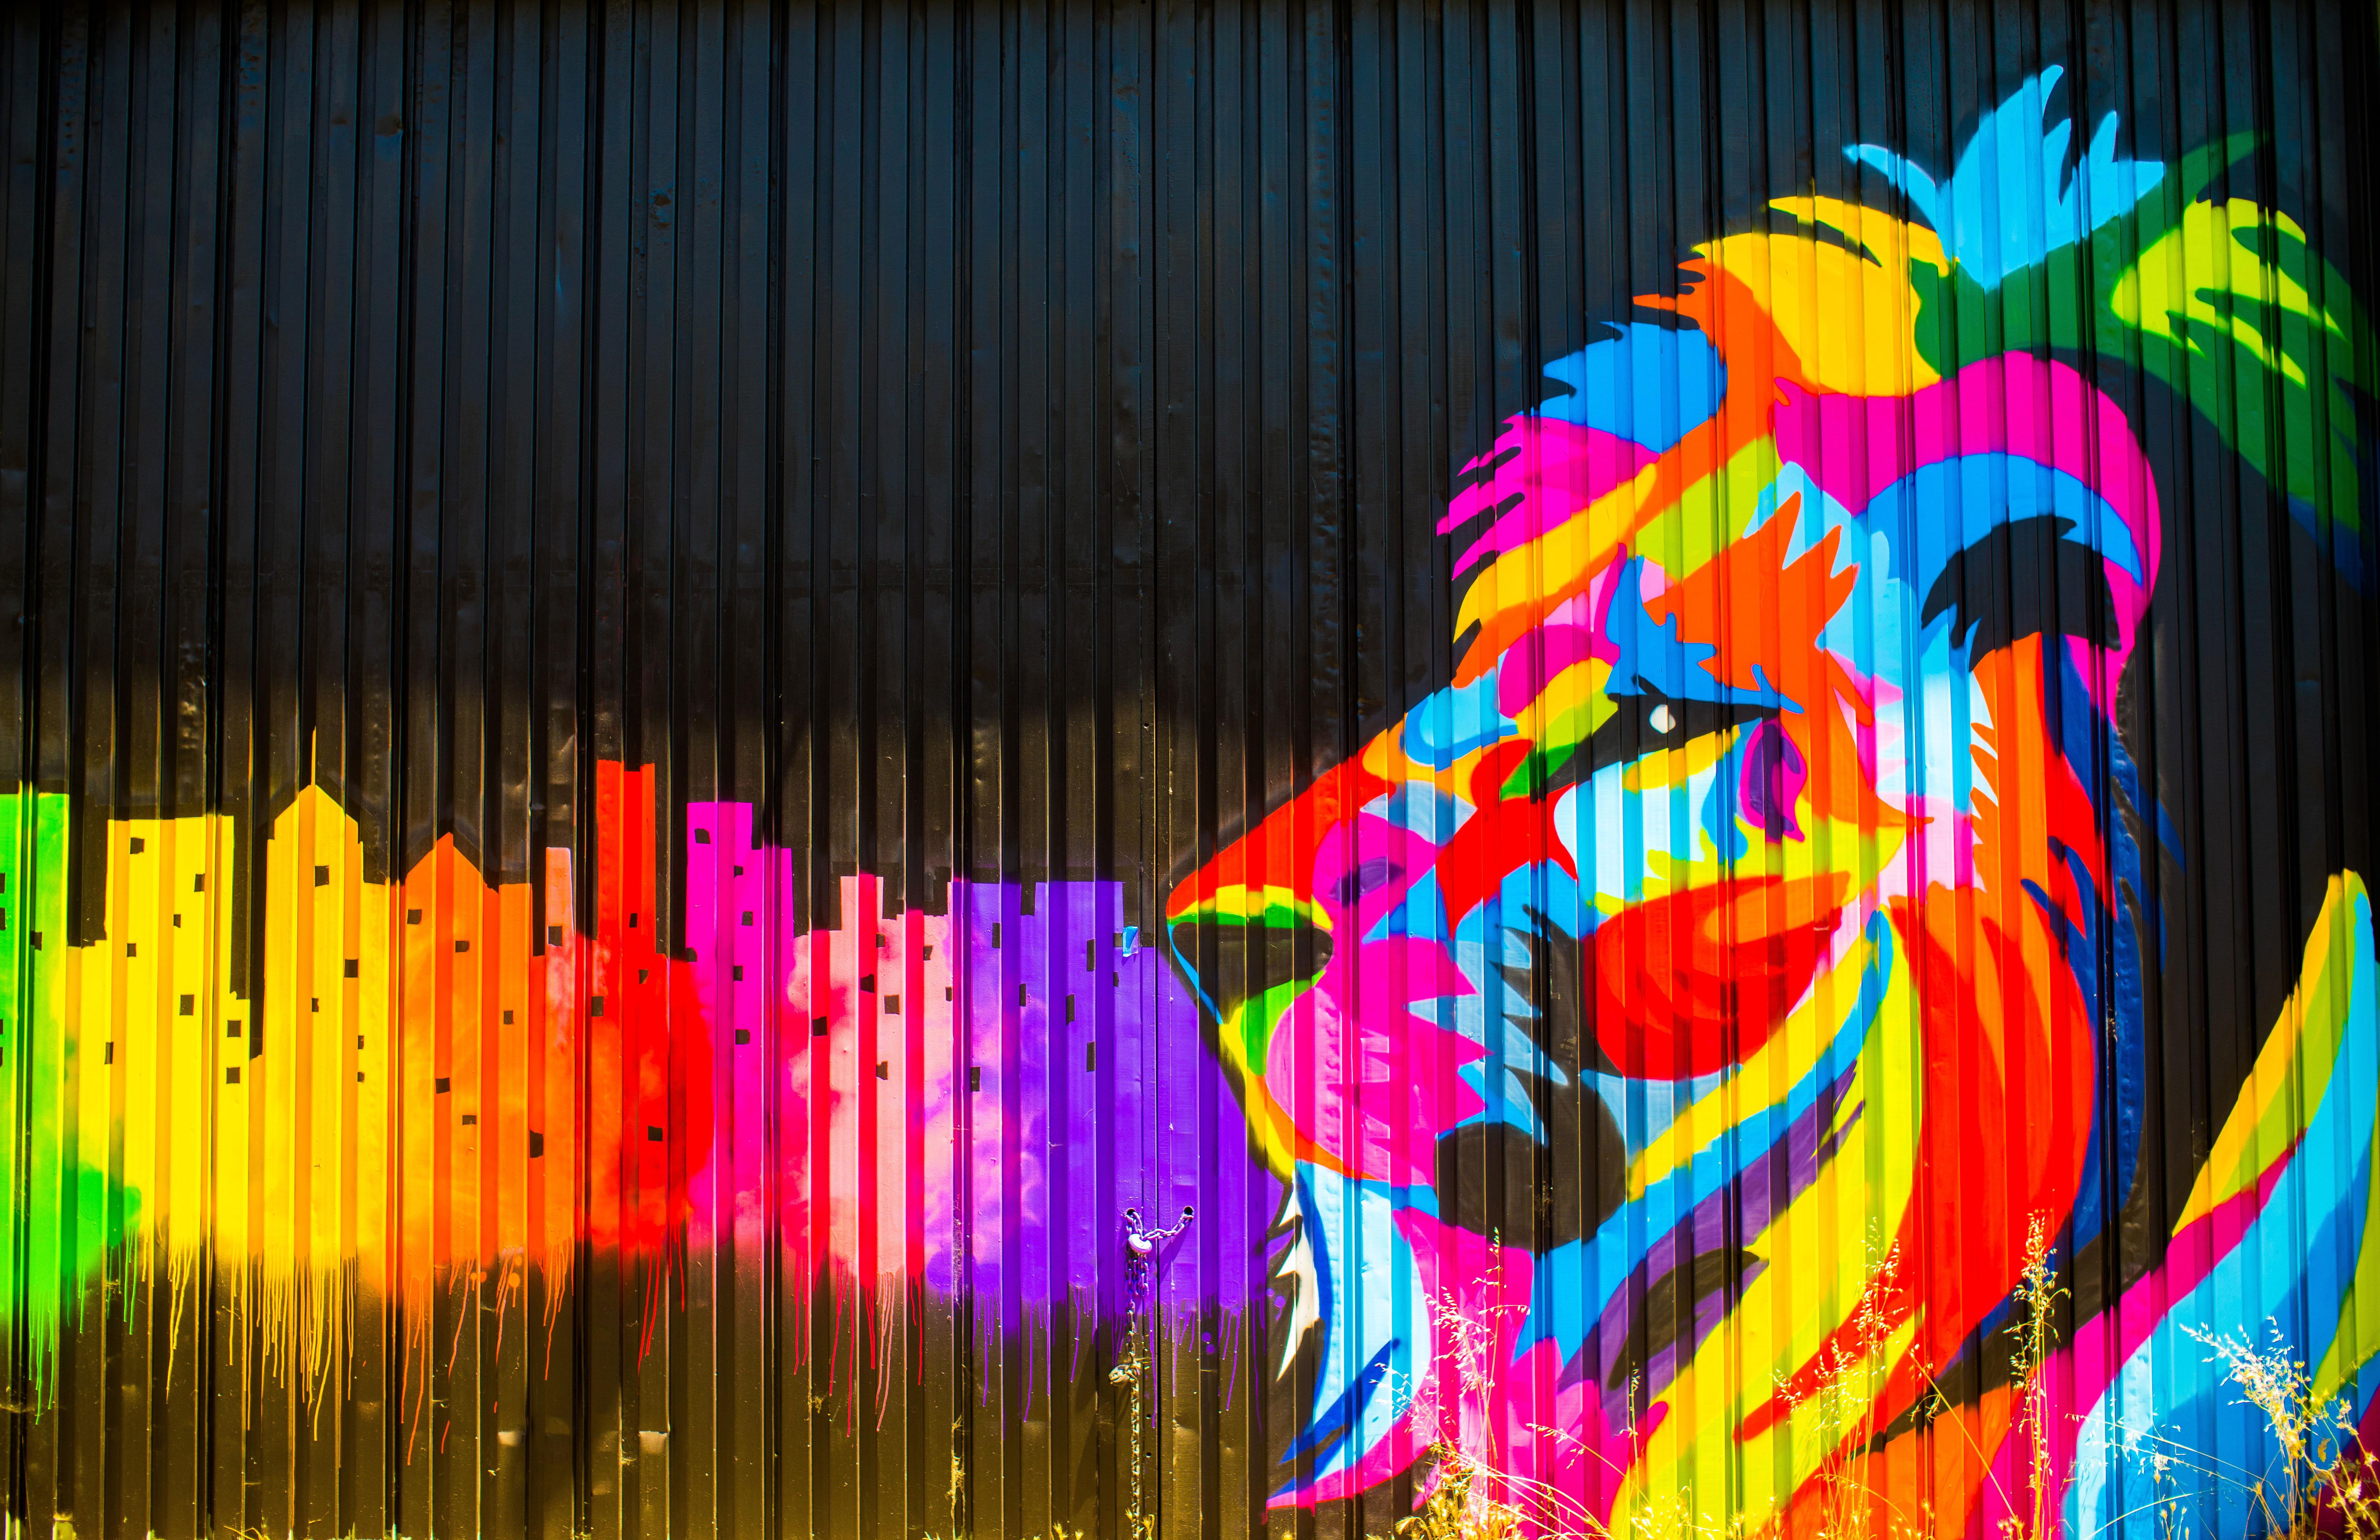 Lion graffiti 5k